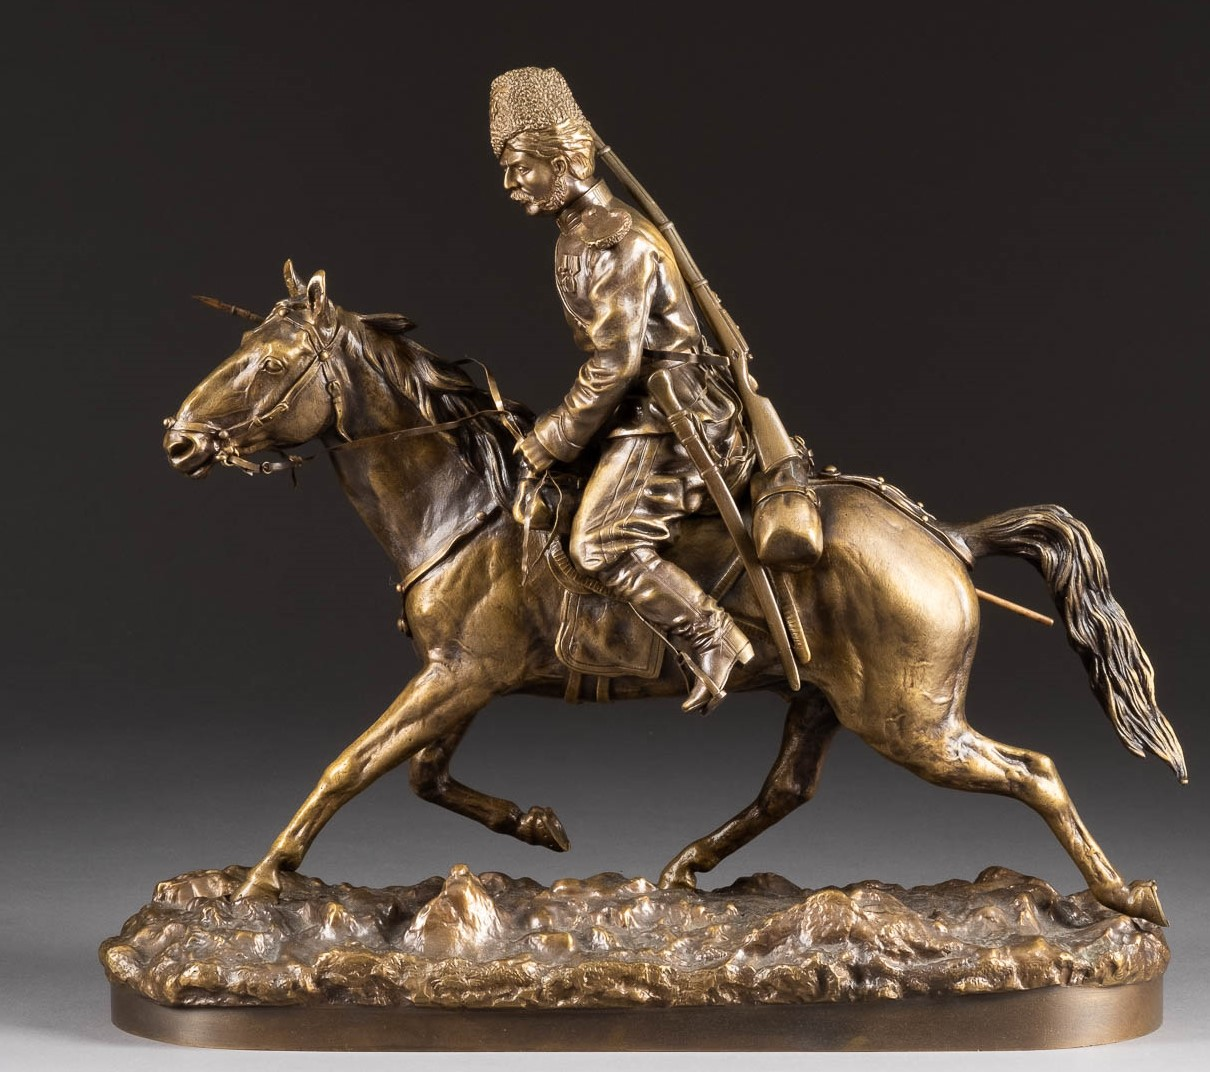 Samonoff russian cossack bronze statue value